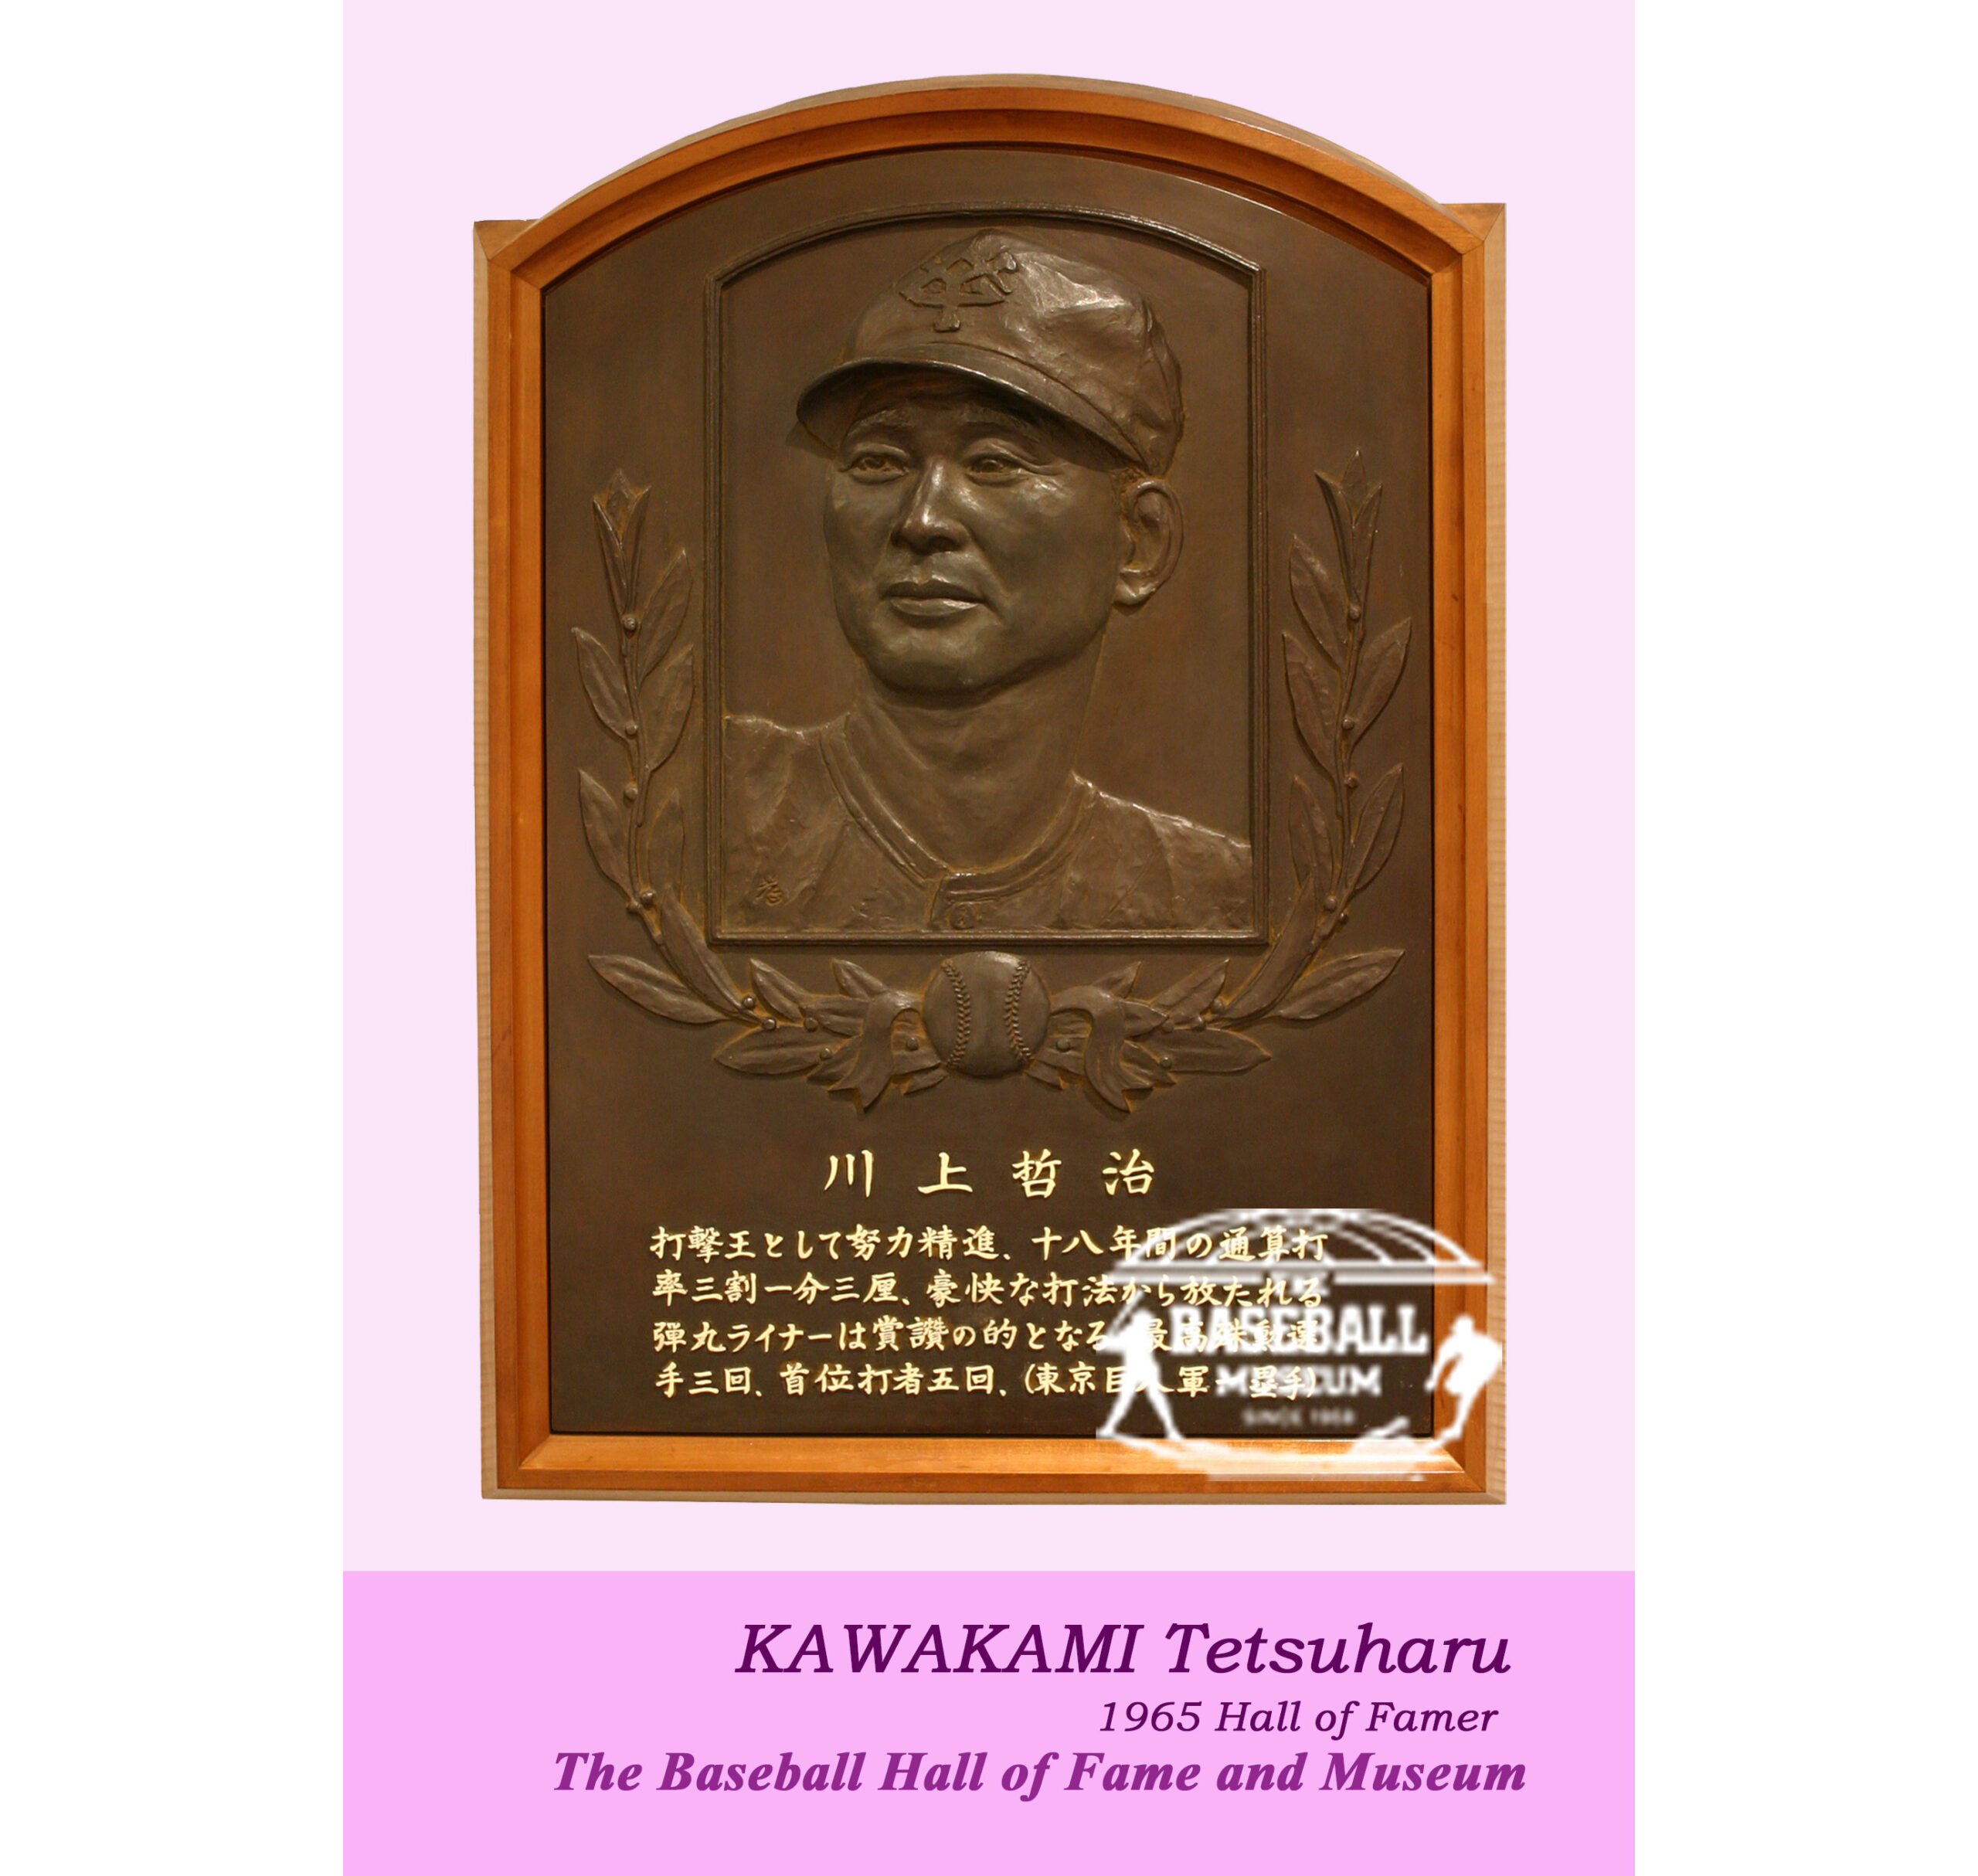 sp-postcard-kawakami